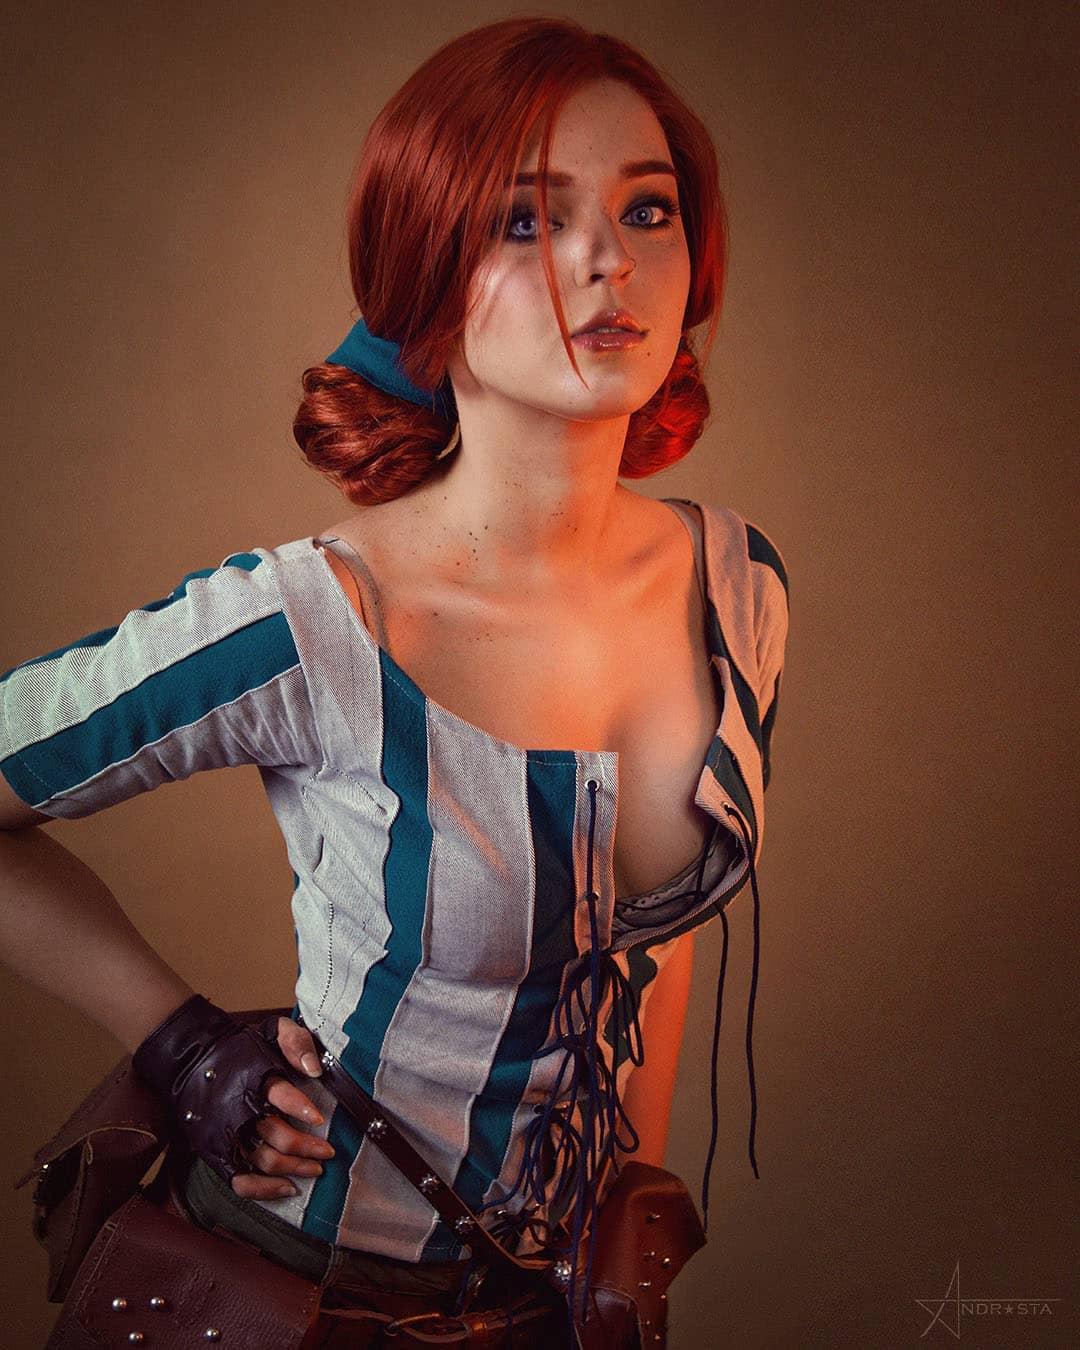 riss Merigold cosplay by Andrasta